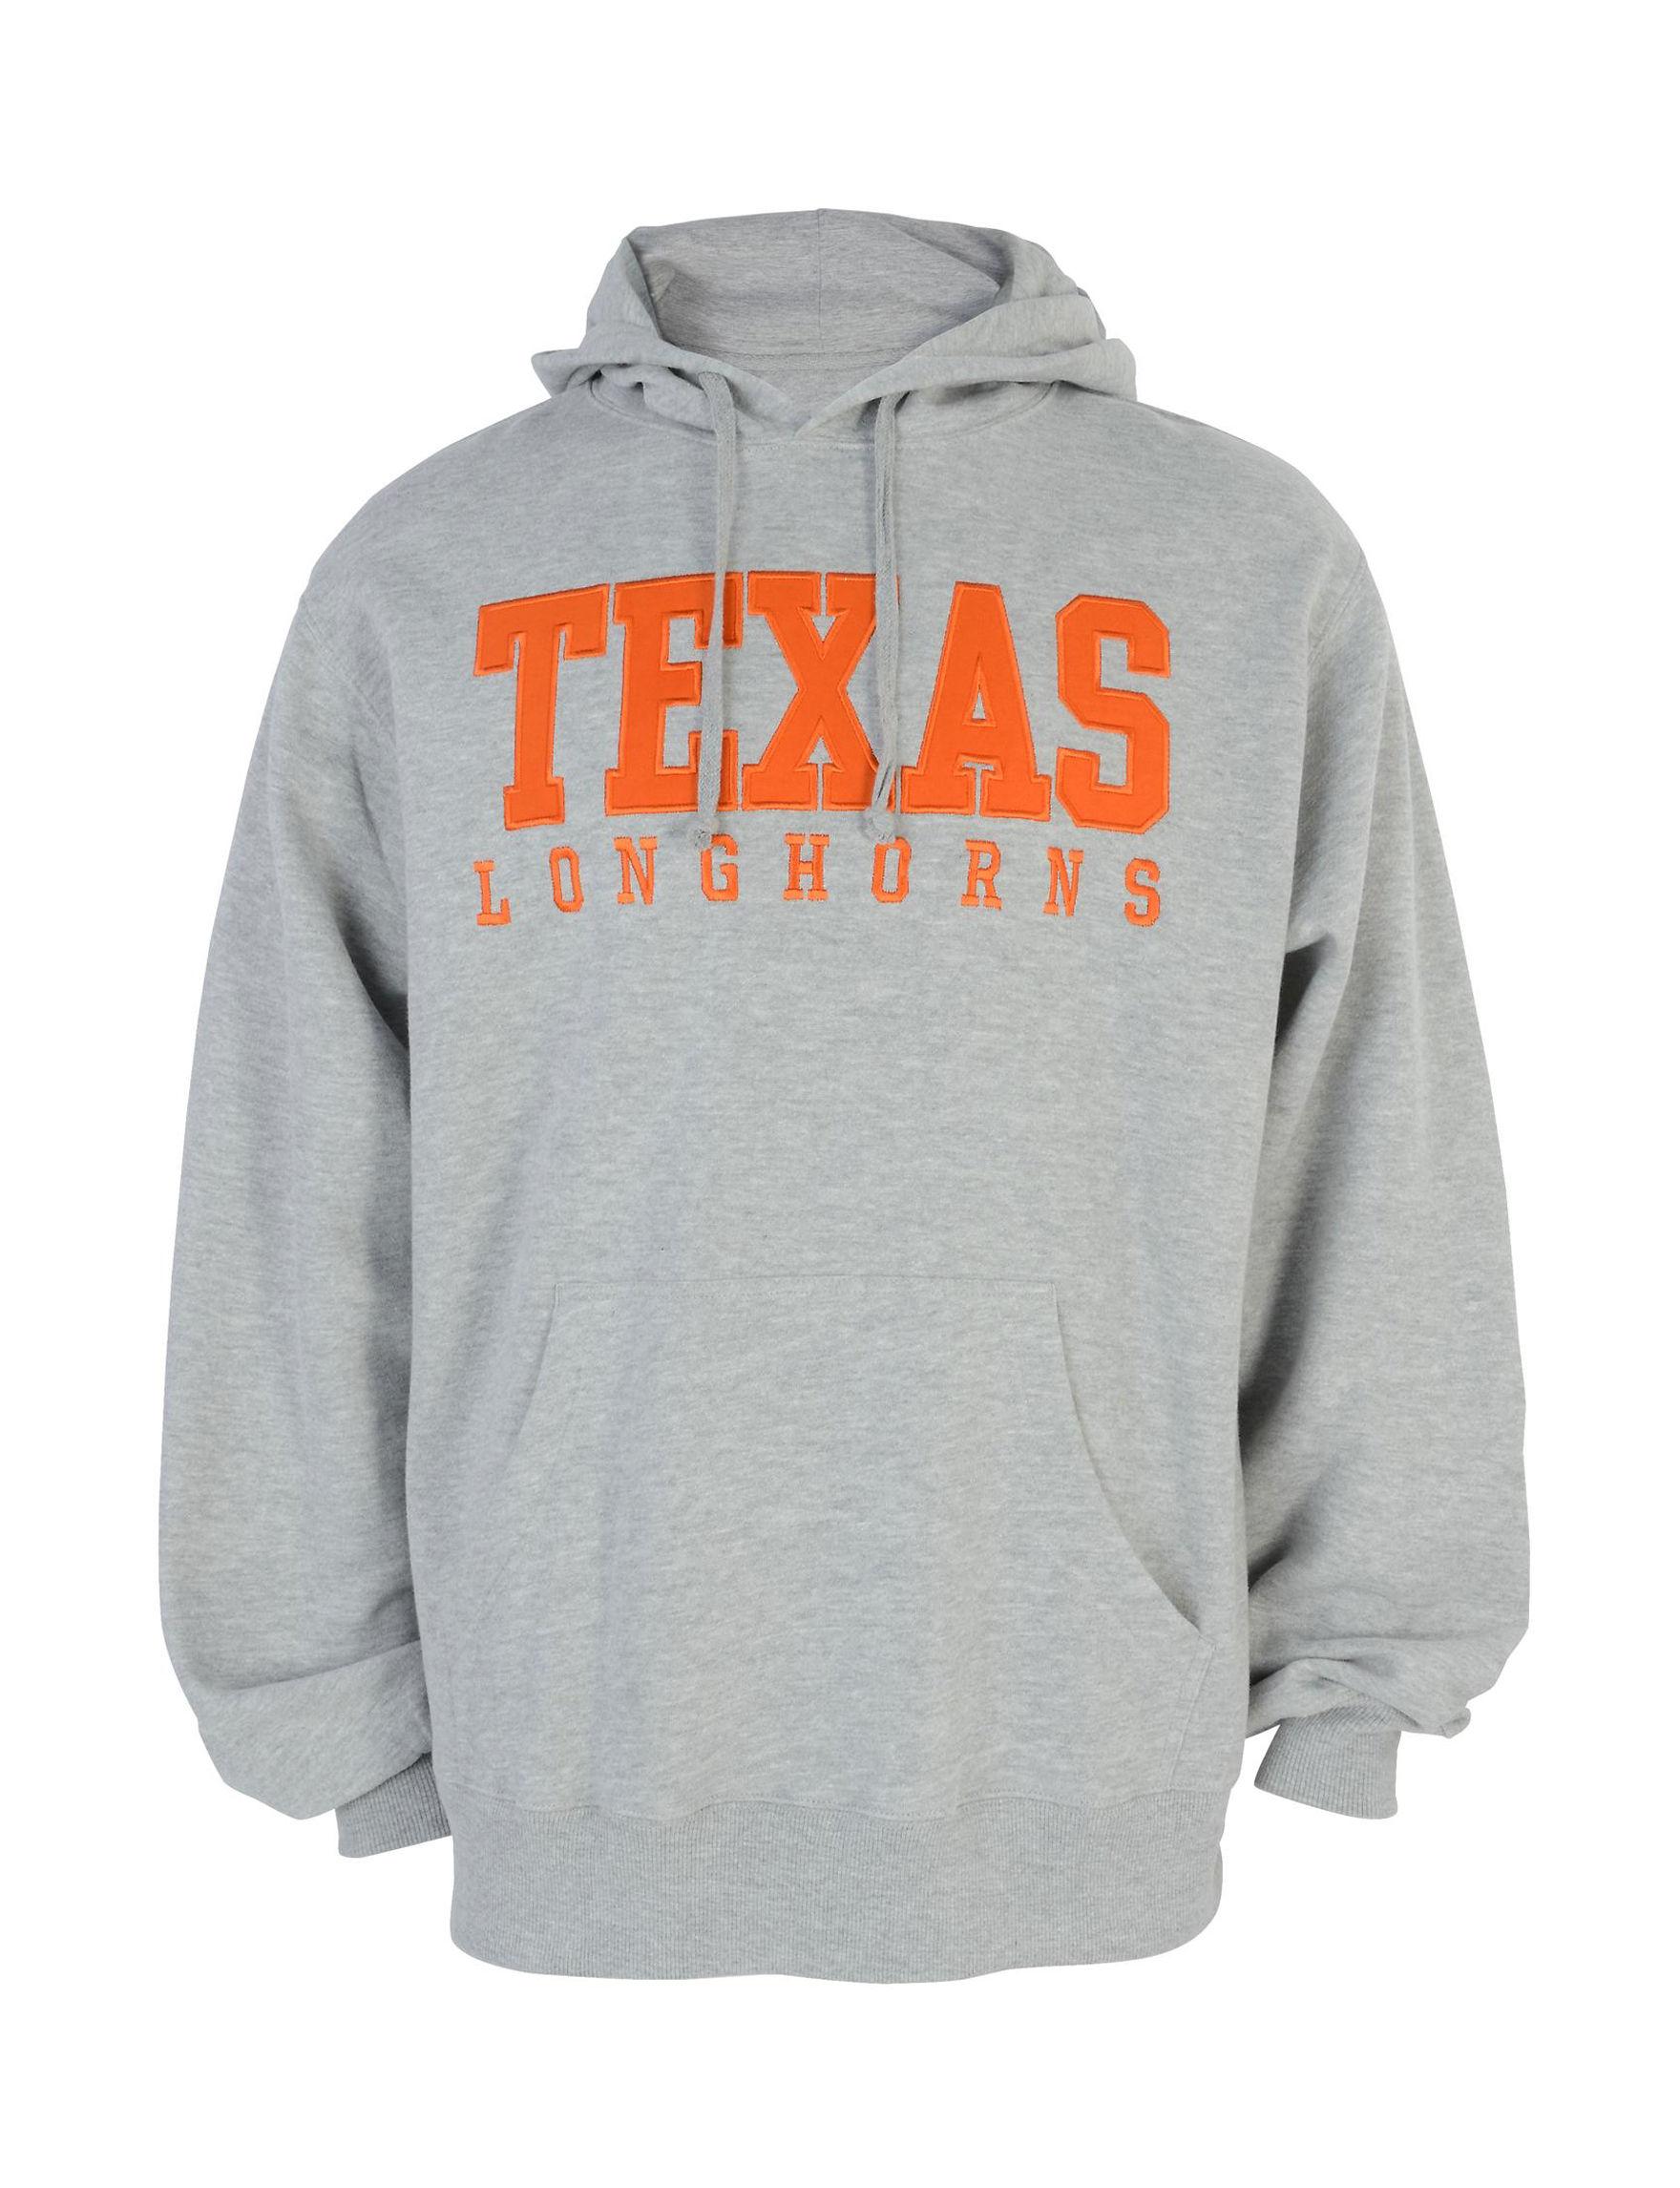 NCAA Grey / Orange Pull-overs